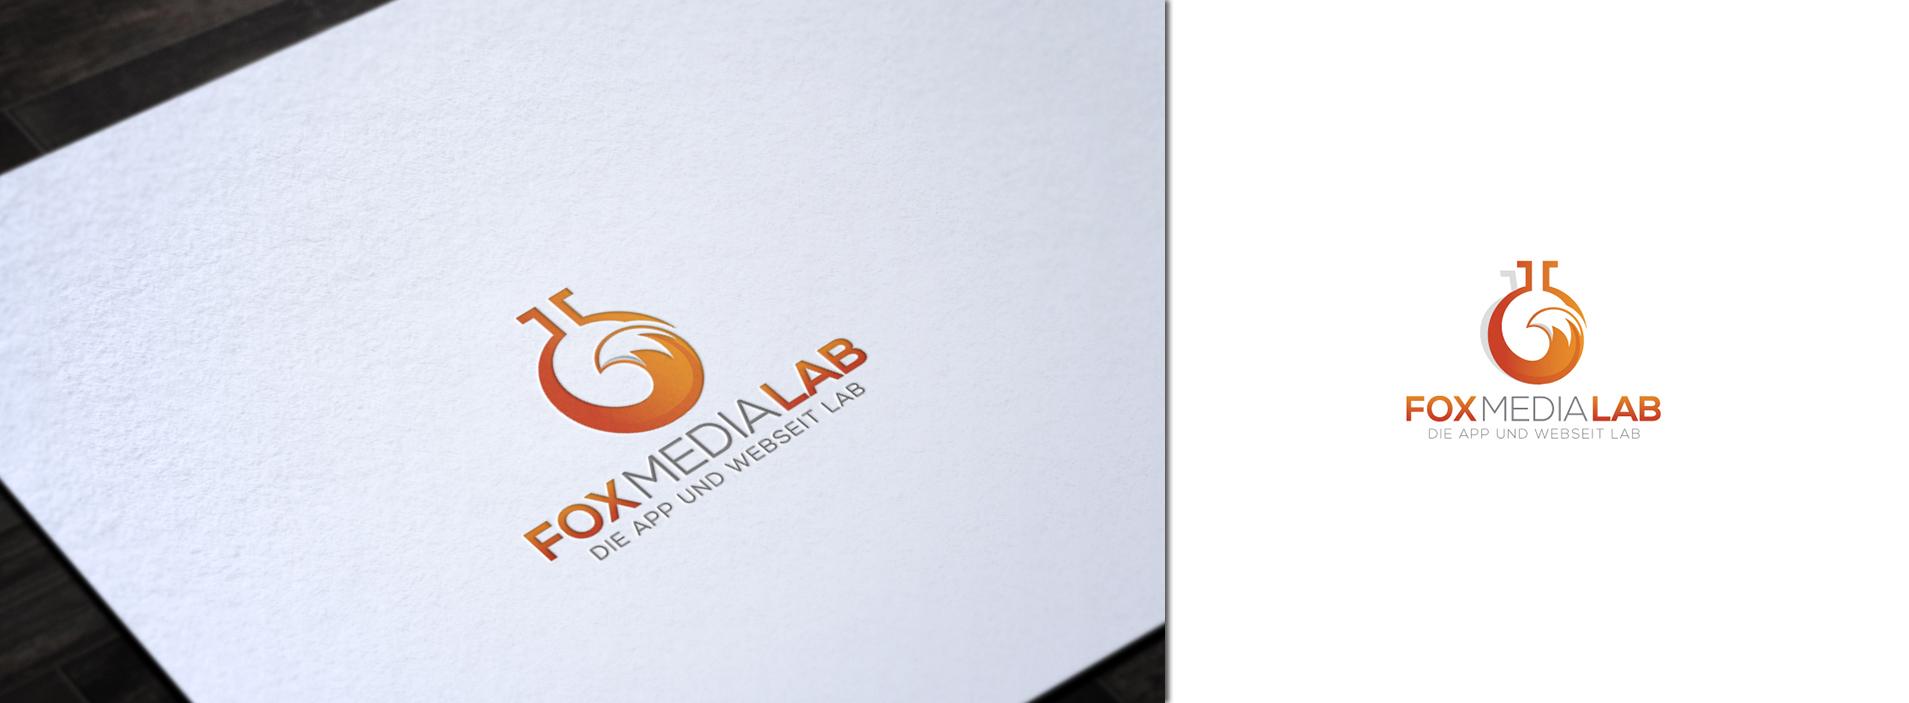 Client Box brand